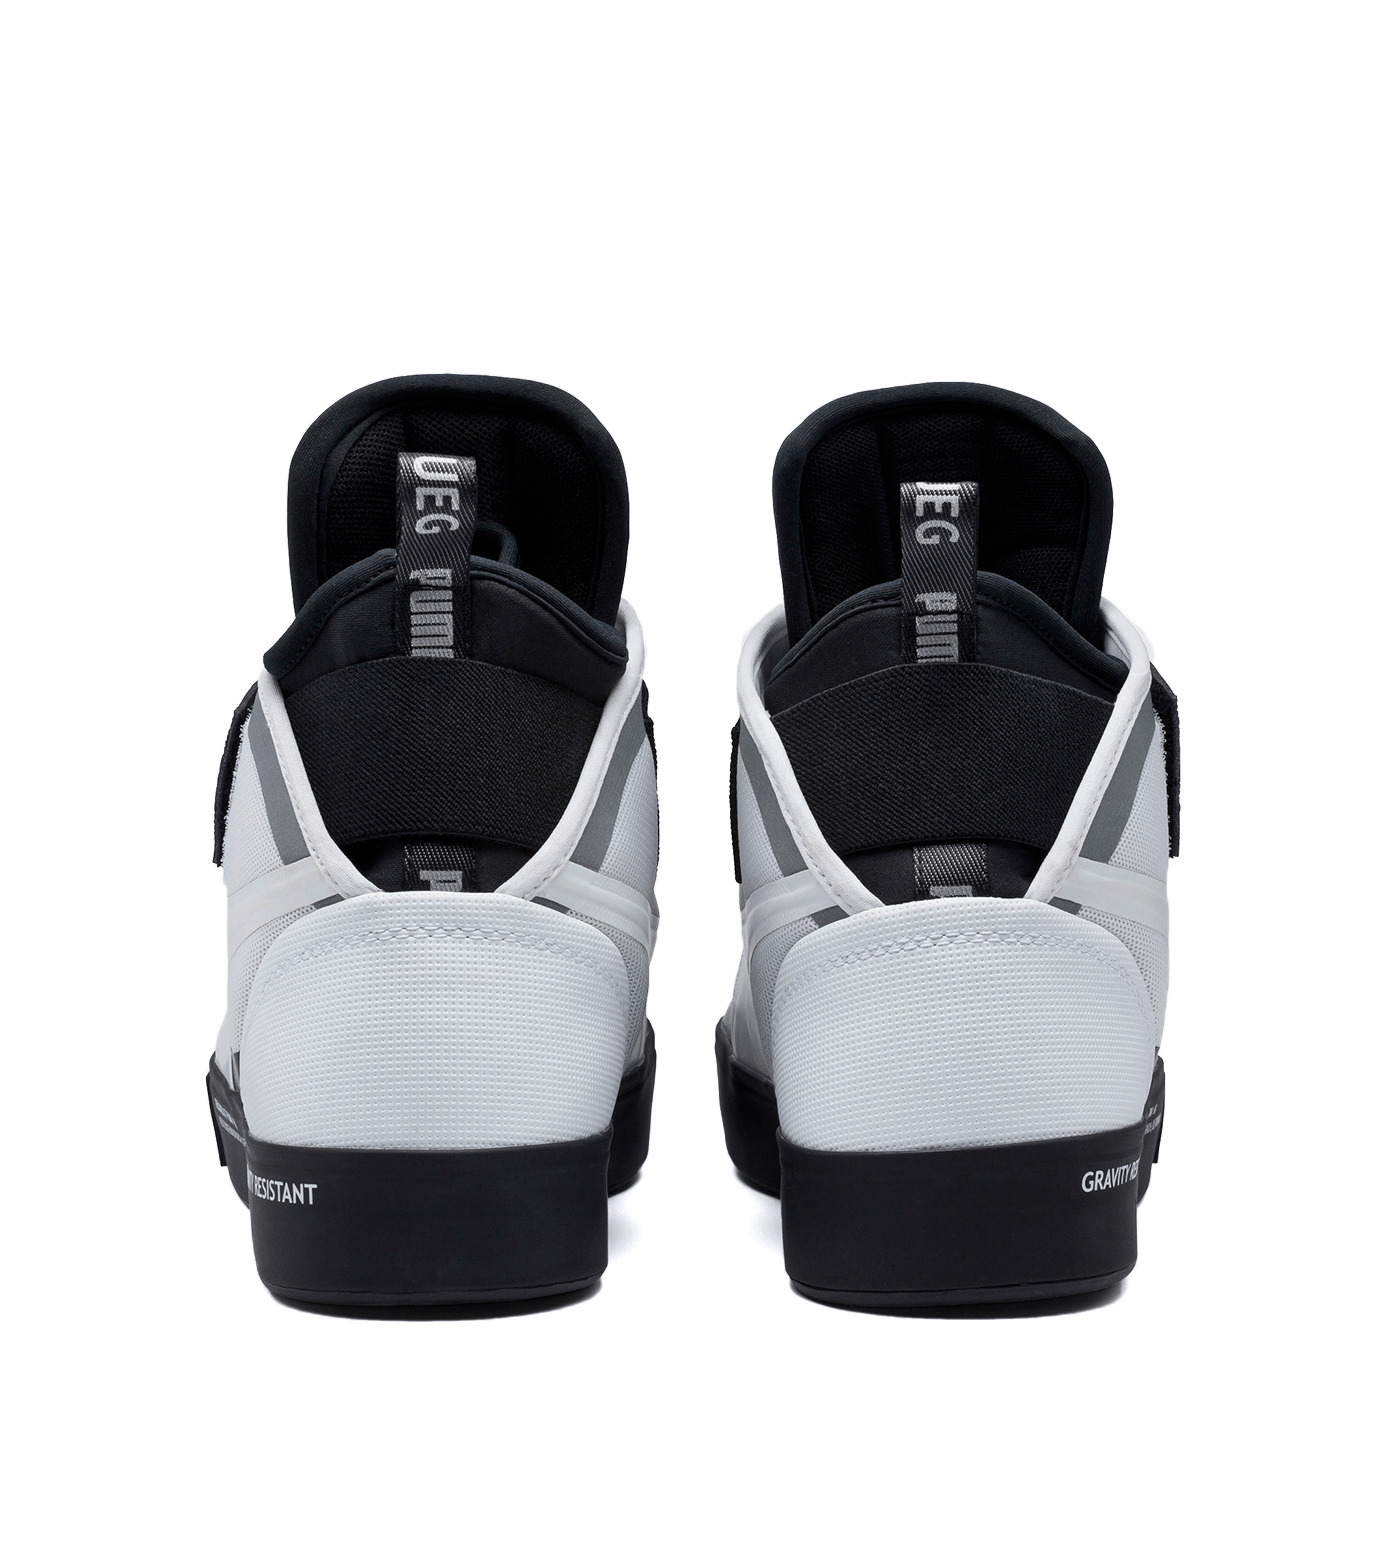 PUMA(プーマ)のCOURT PLAY X UEG-WHITE(シューズ/shoes)-361497-4 拡大詳細画像5